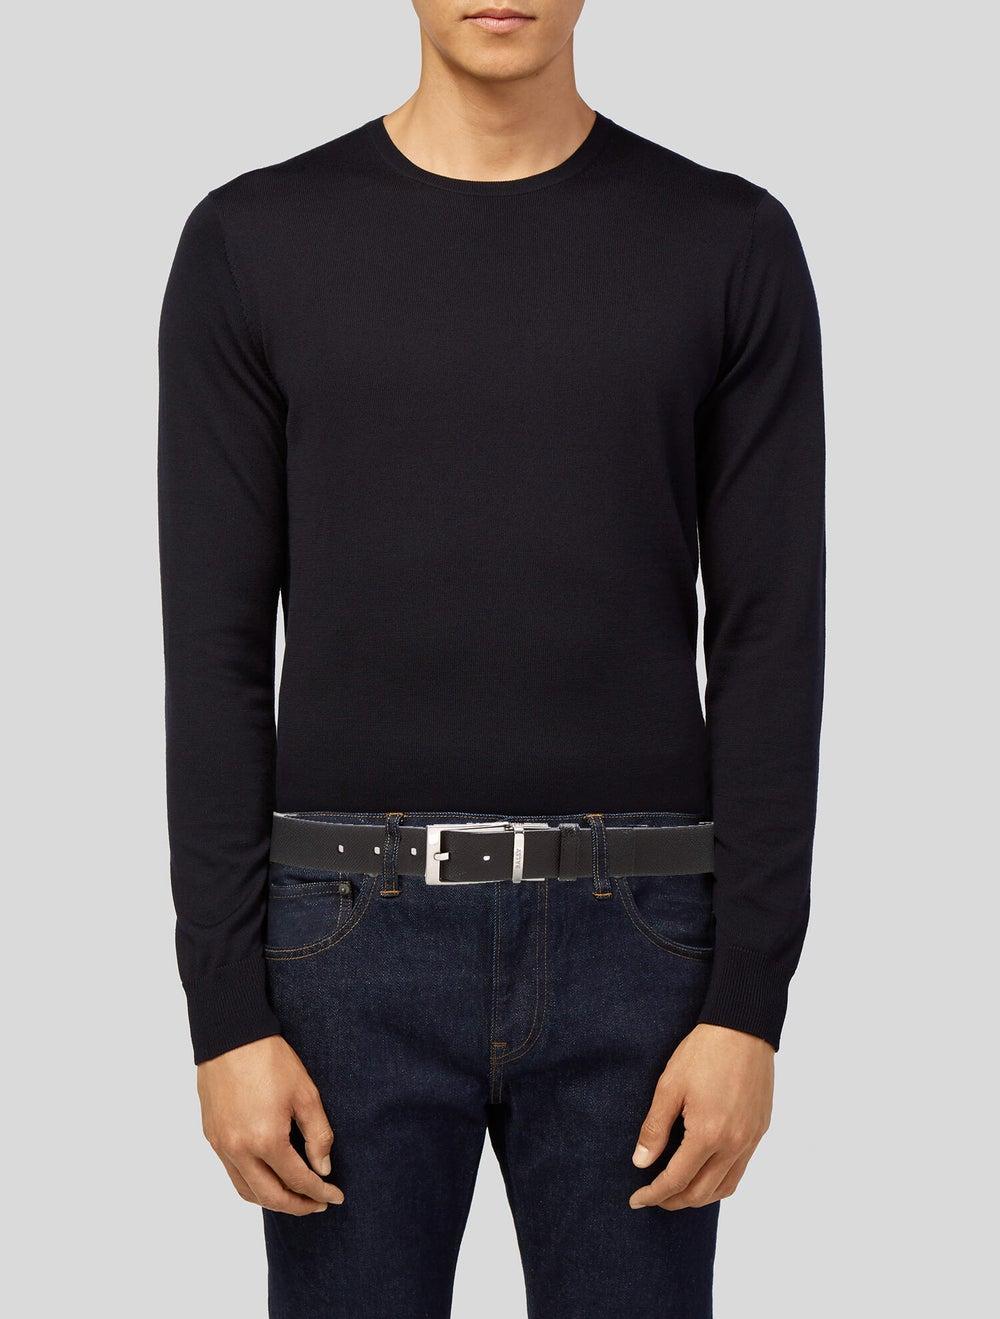 Bally Reversible Leather Belt black - image 2